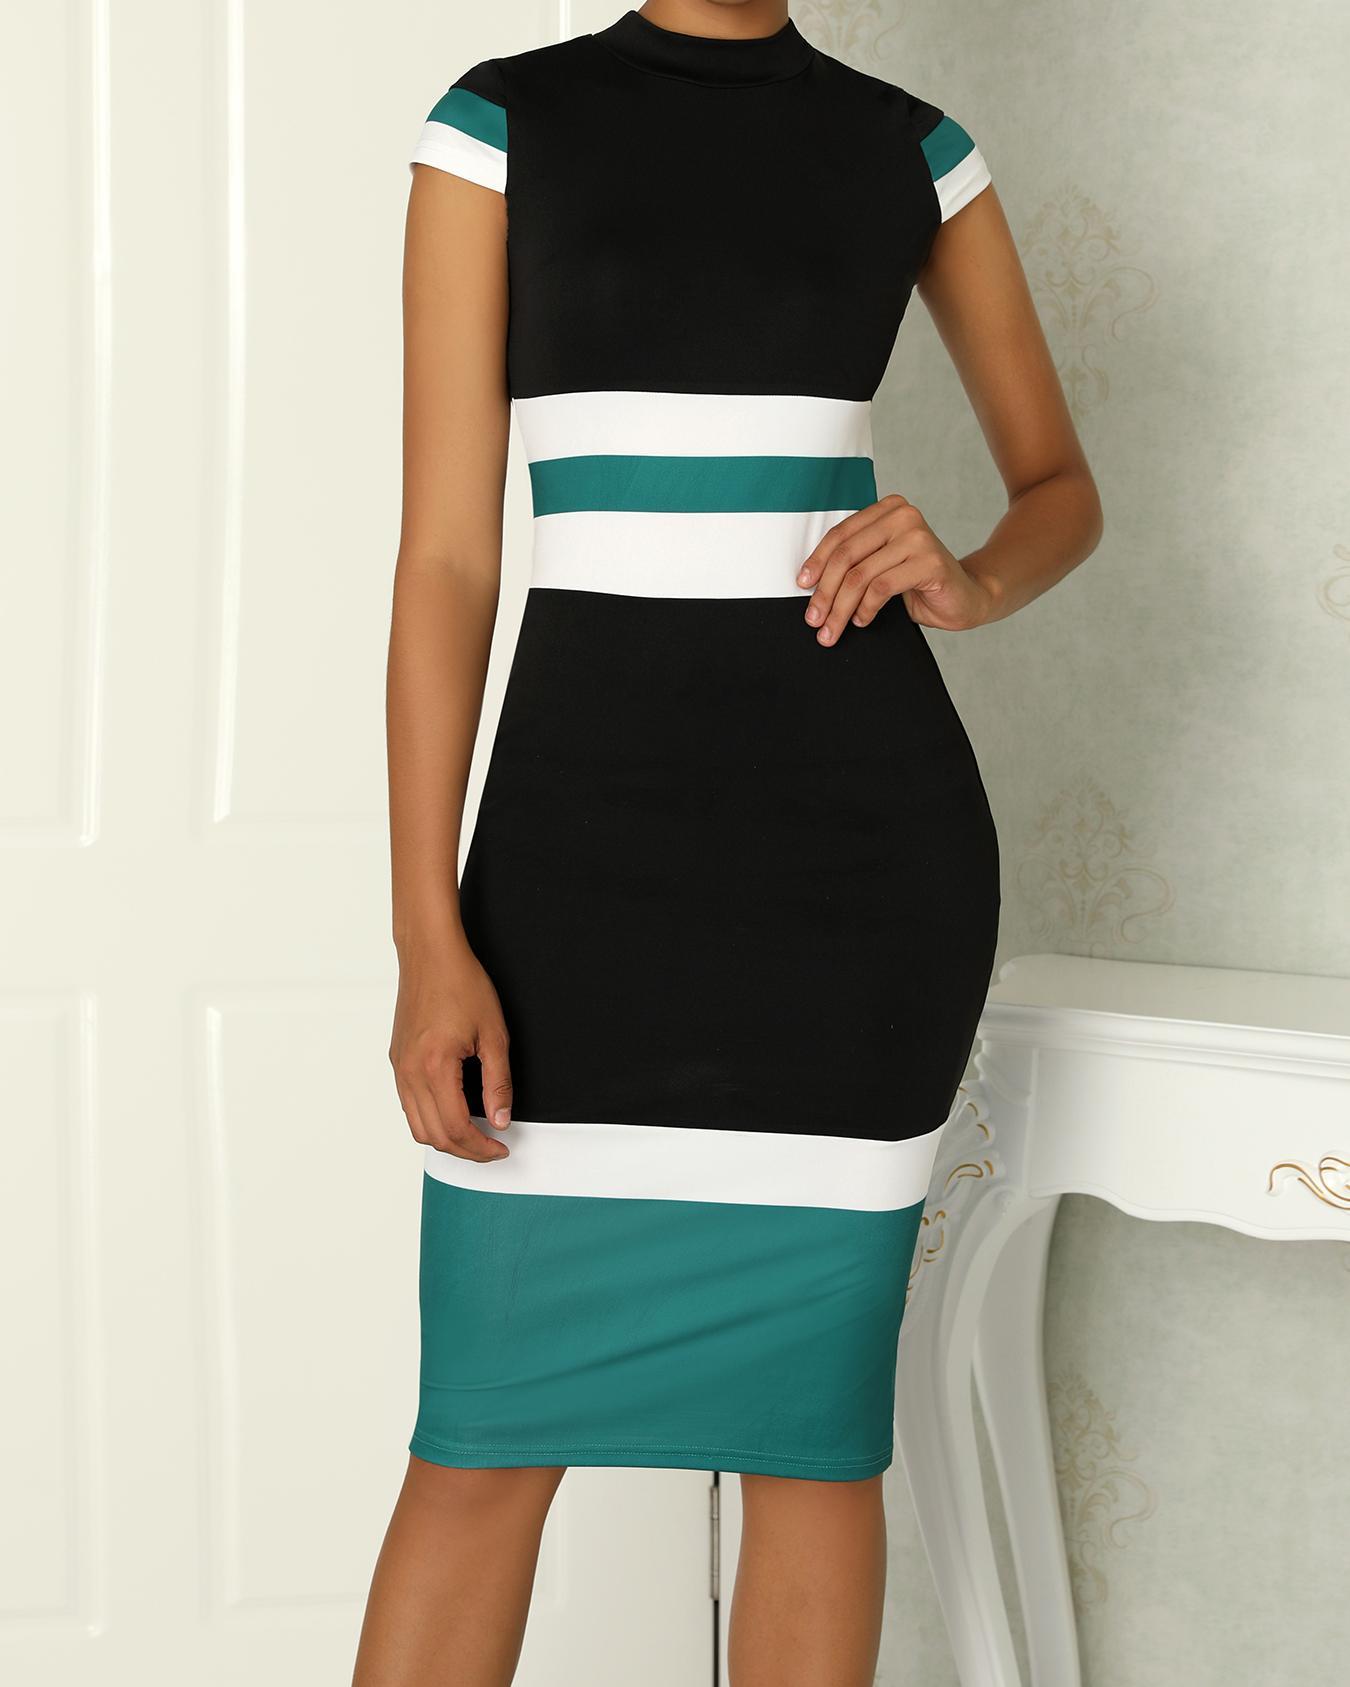 ivrose / Contraste Color Striping Splicing Bodycon Dress